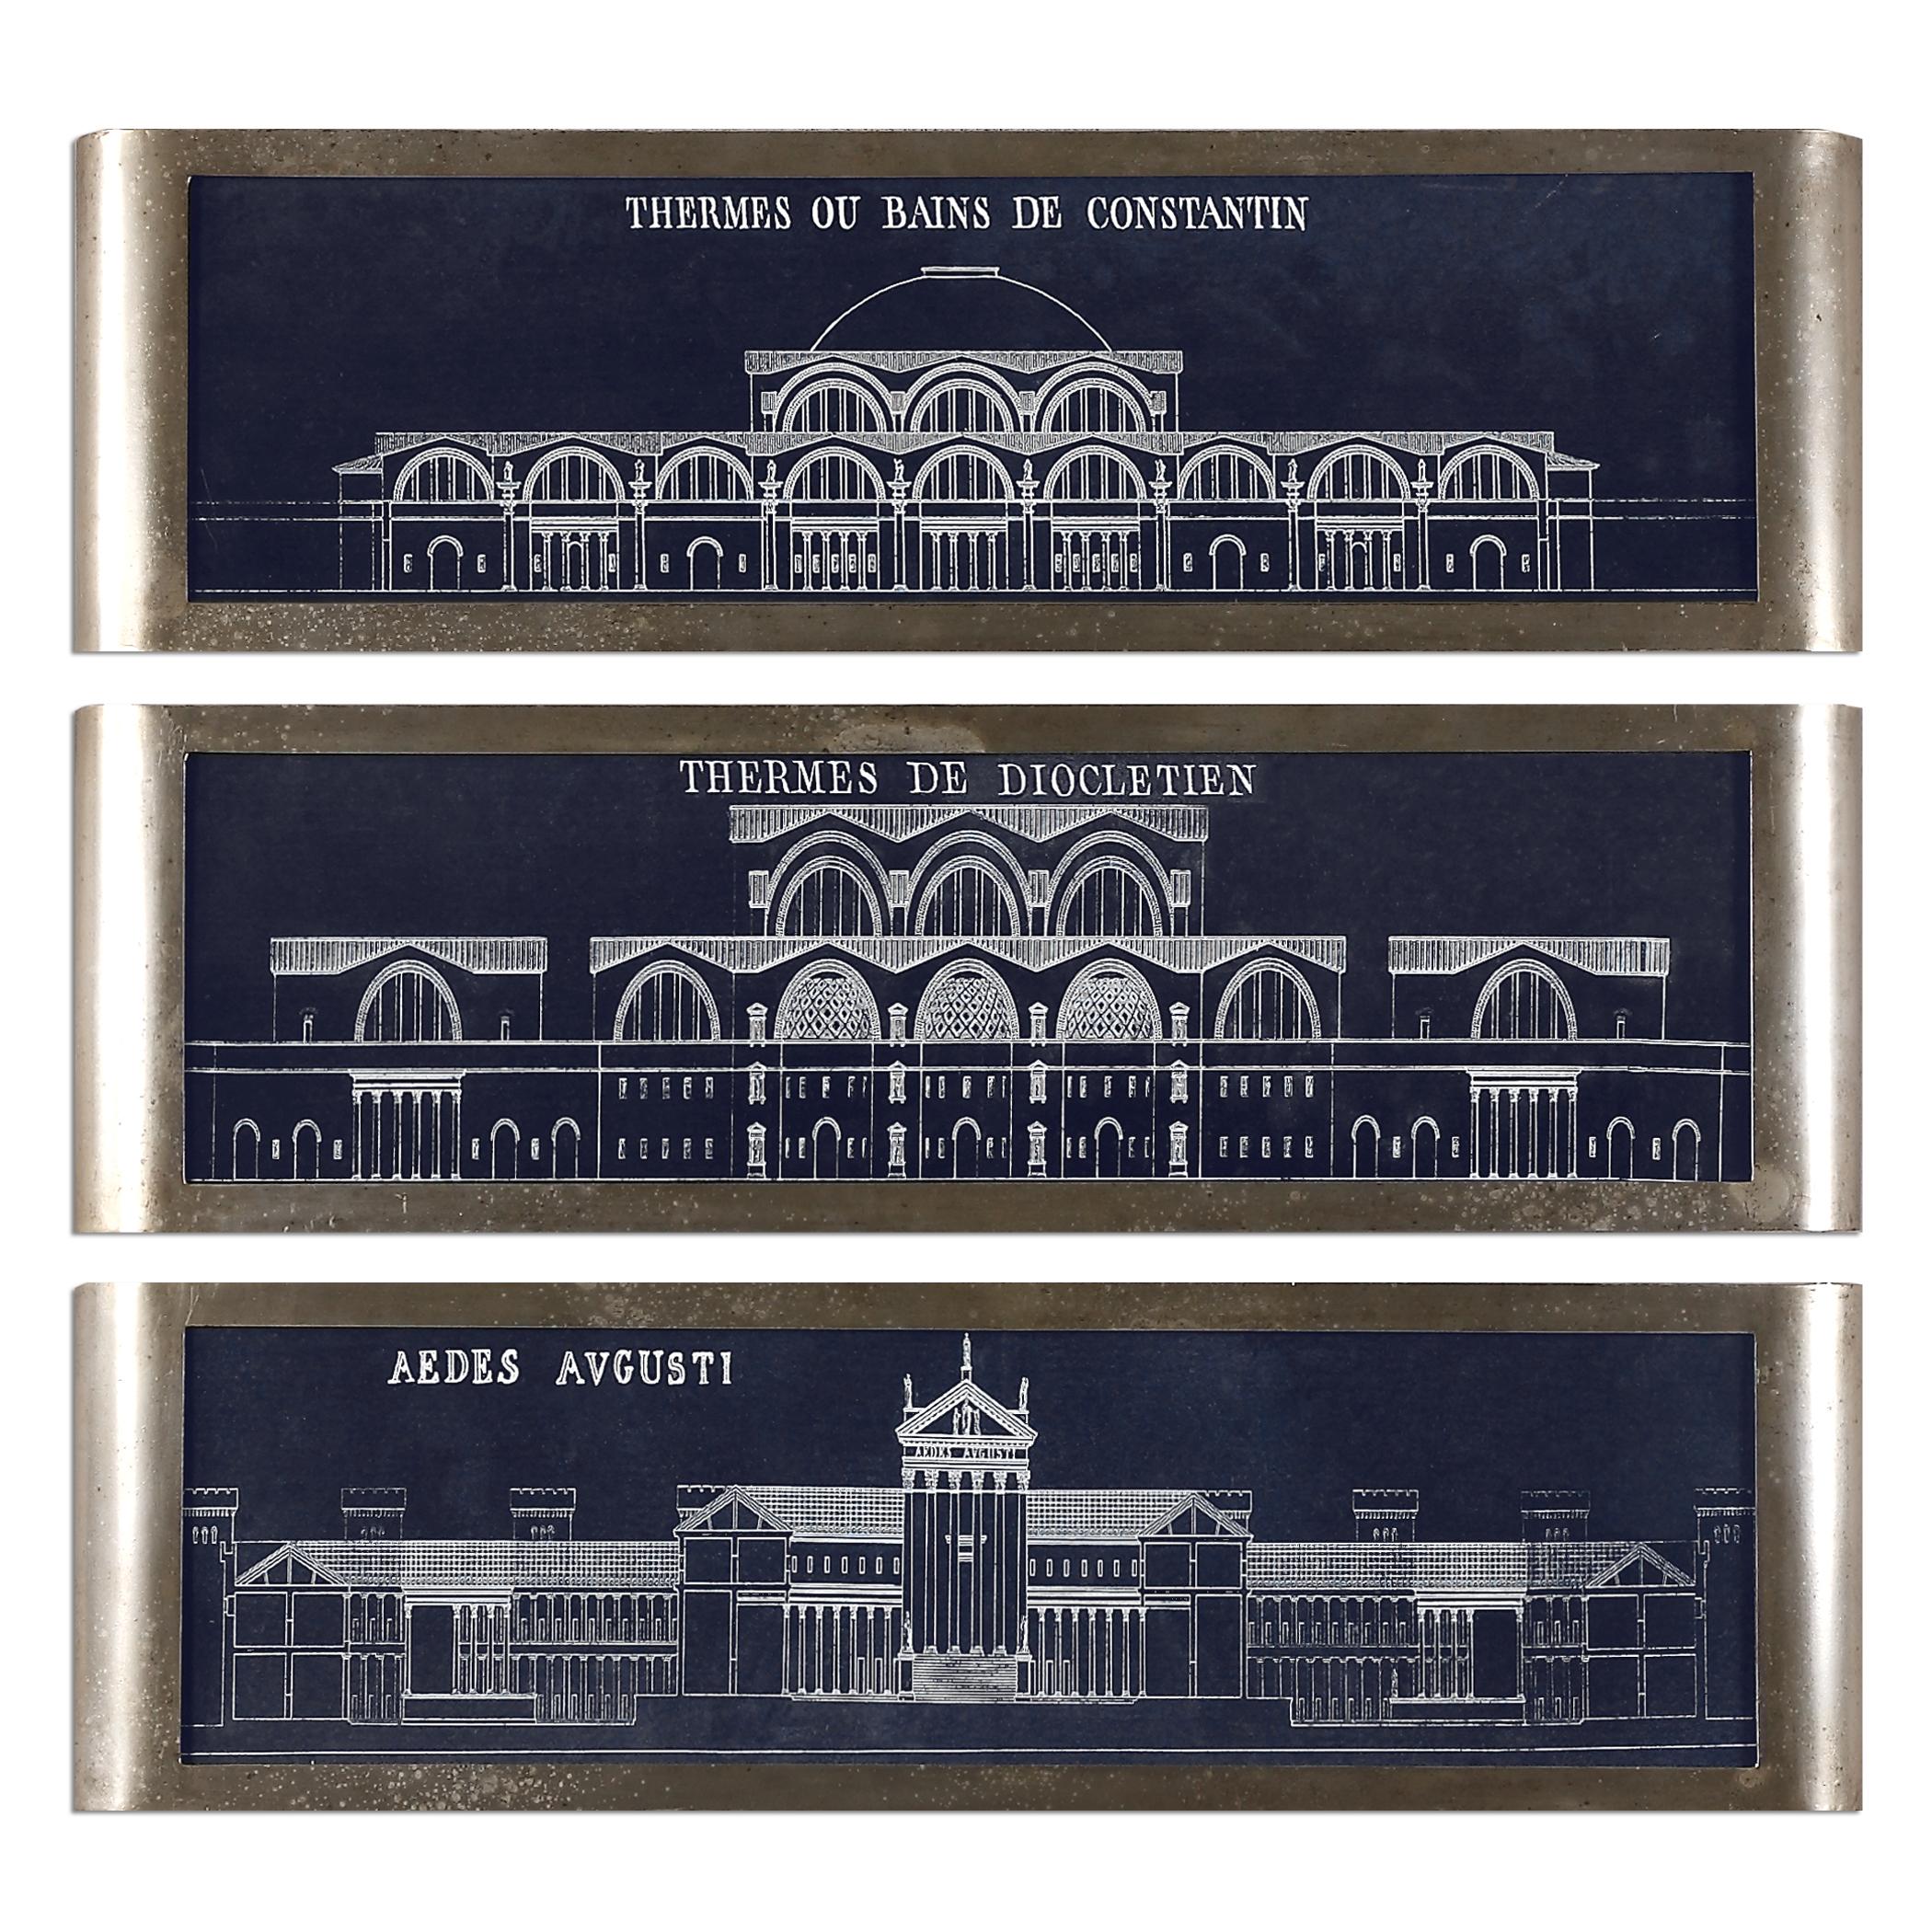 Uttermost Art Architectural Blueprints Art S/3 - Item Number: 35243